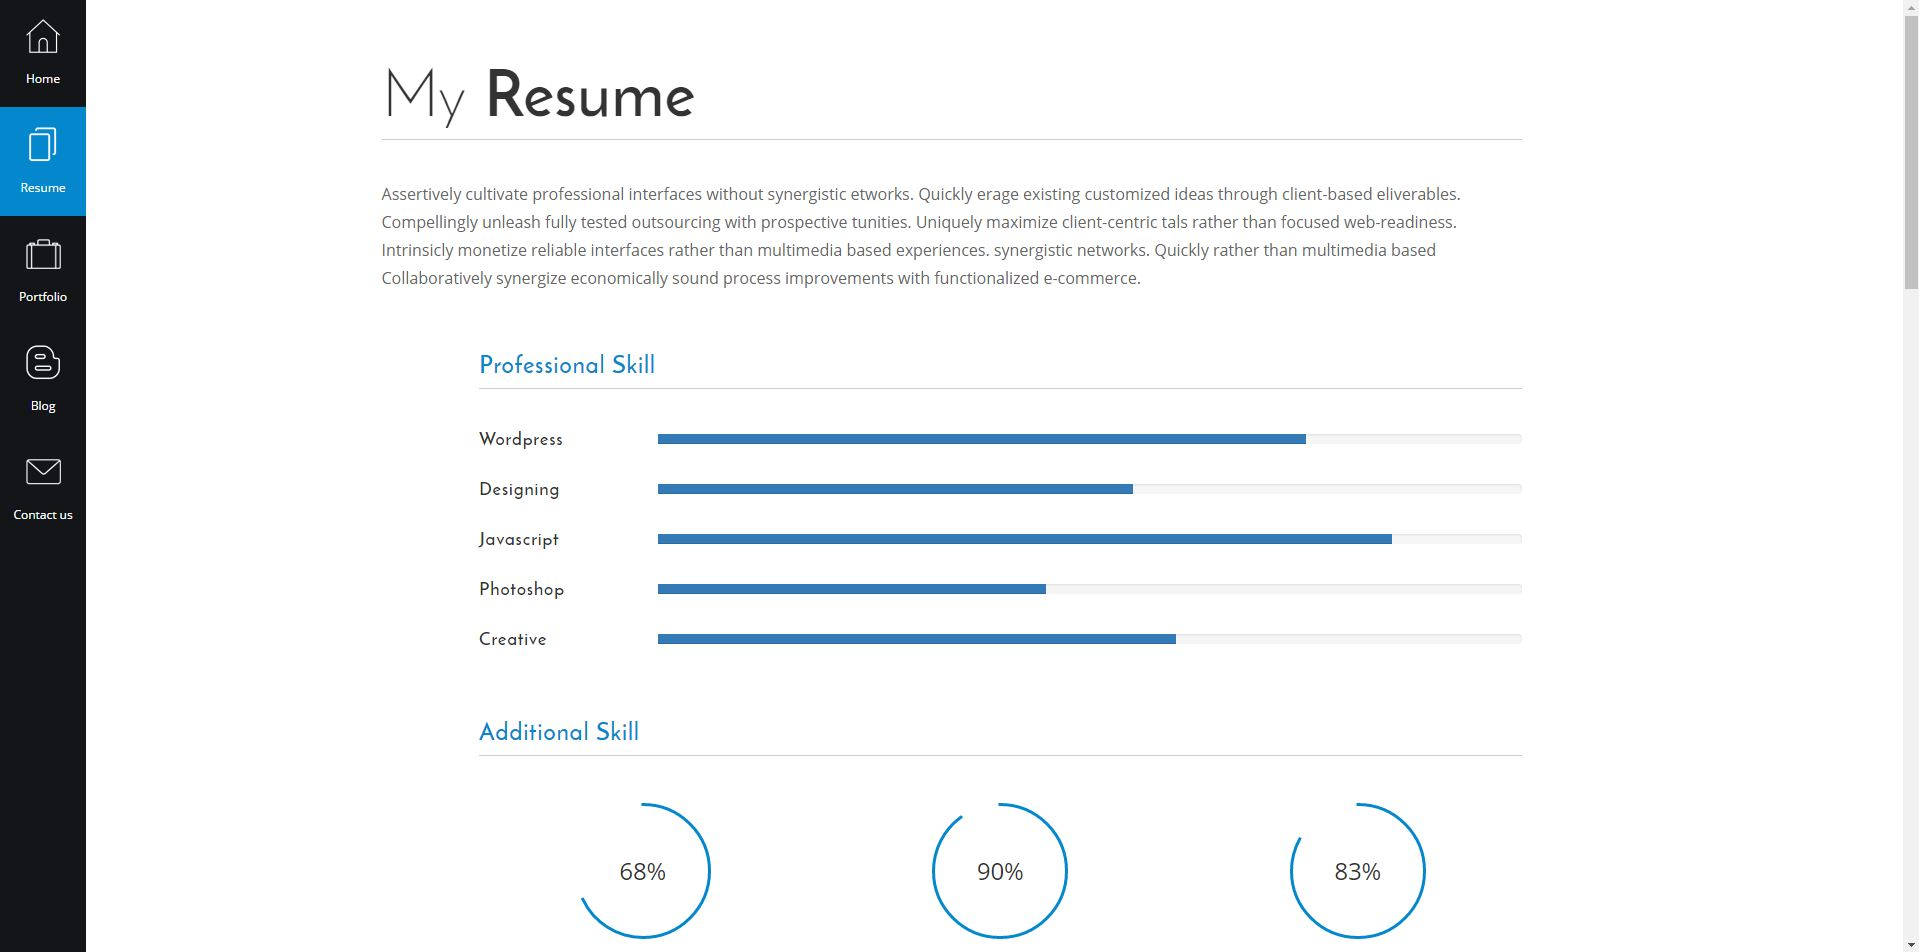 mr lancer personal cv resume template angular version by mr lancer personal cv resume template angular version